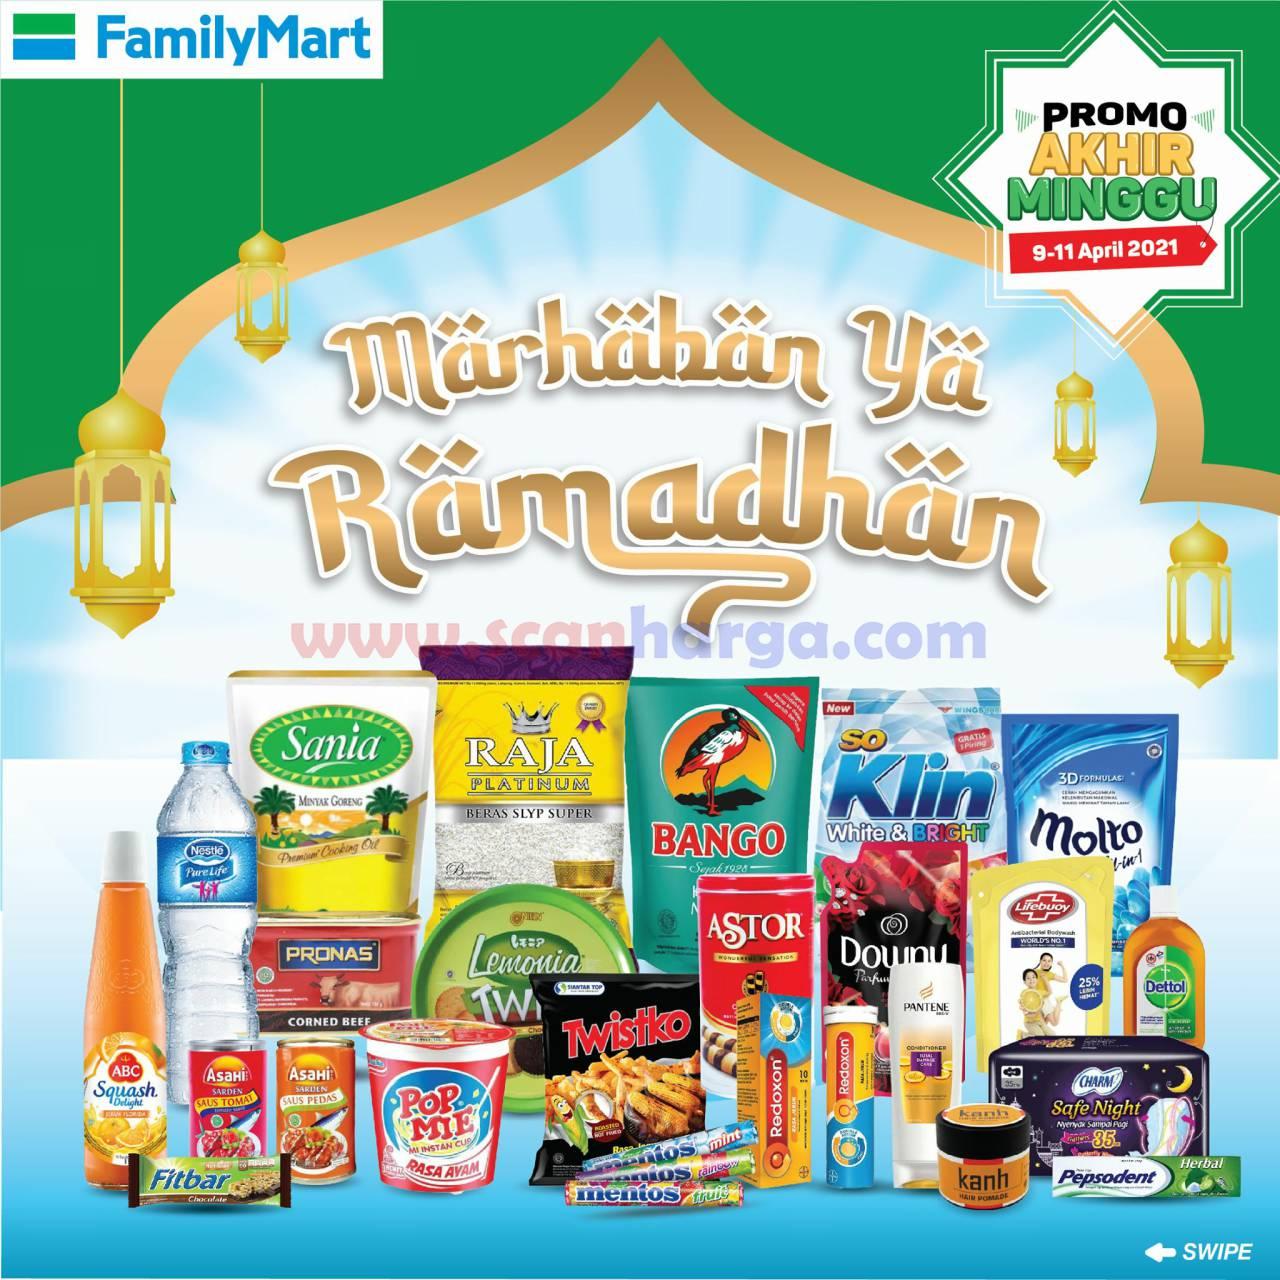 Katalog Promo JSM Family Mart Weekend 9 - 11 April 2021